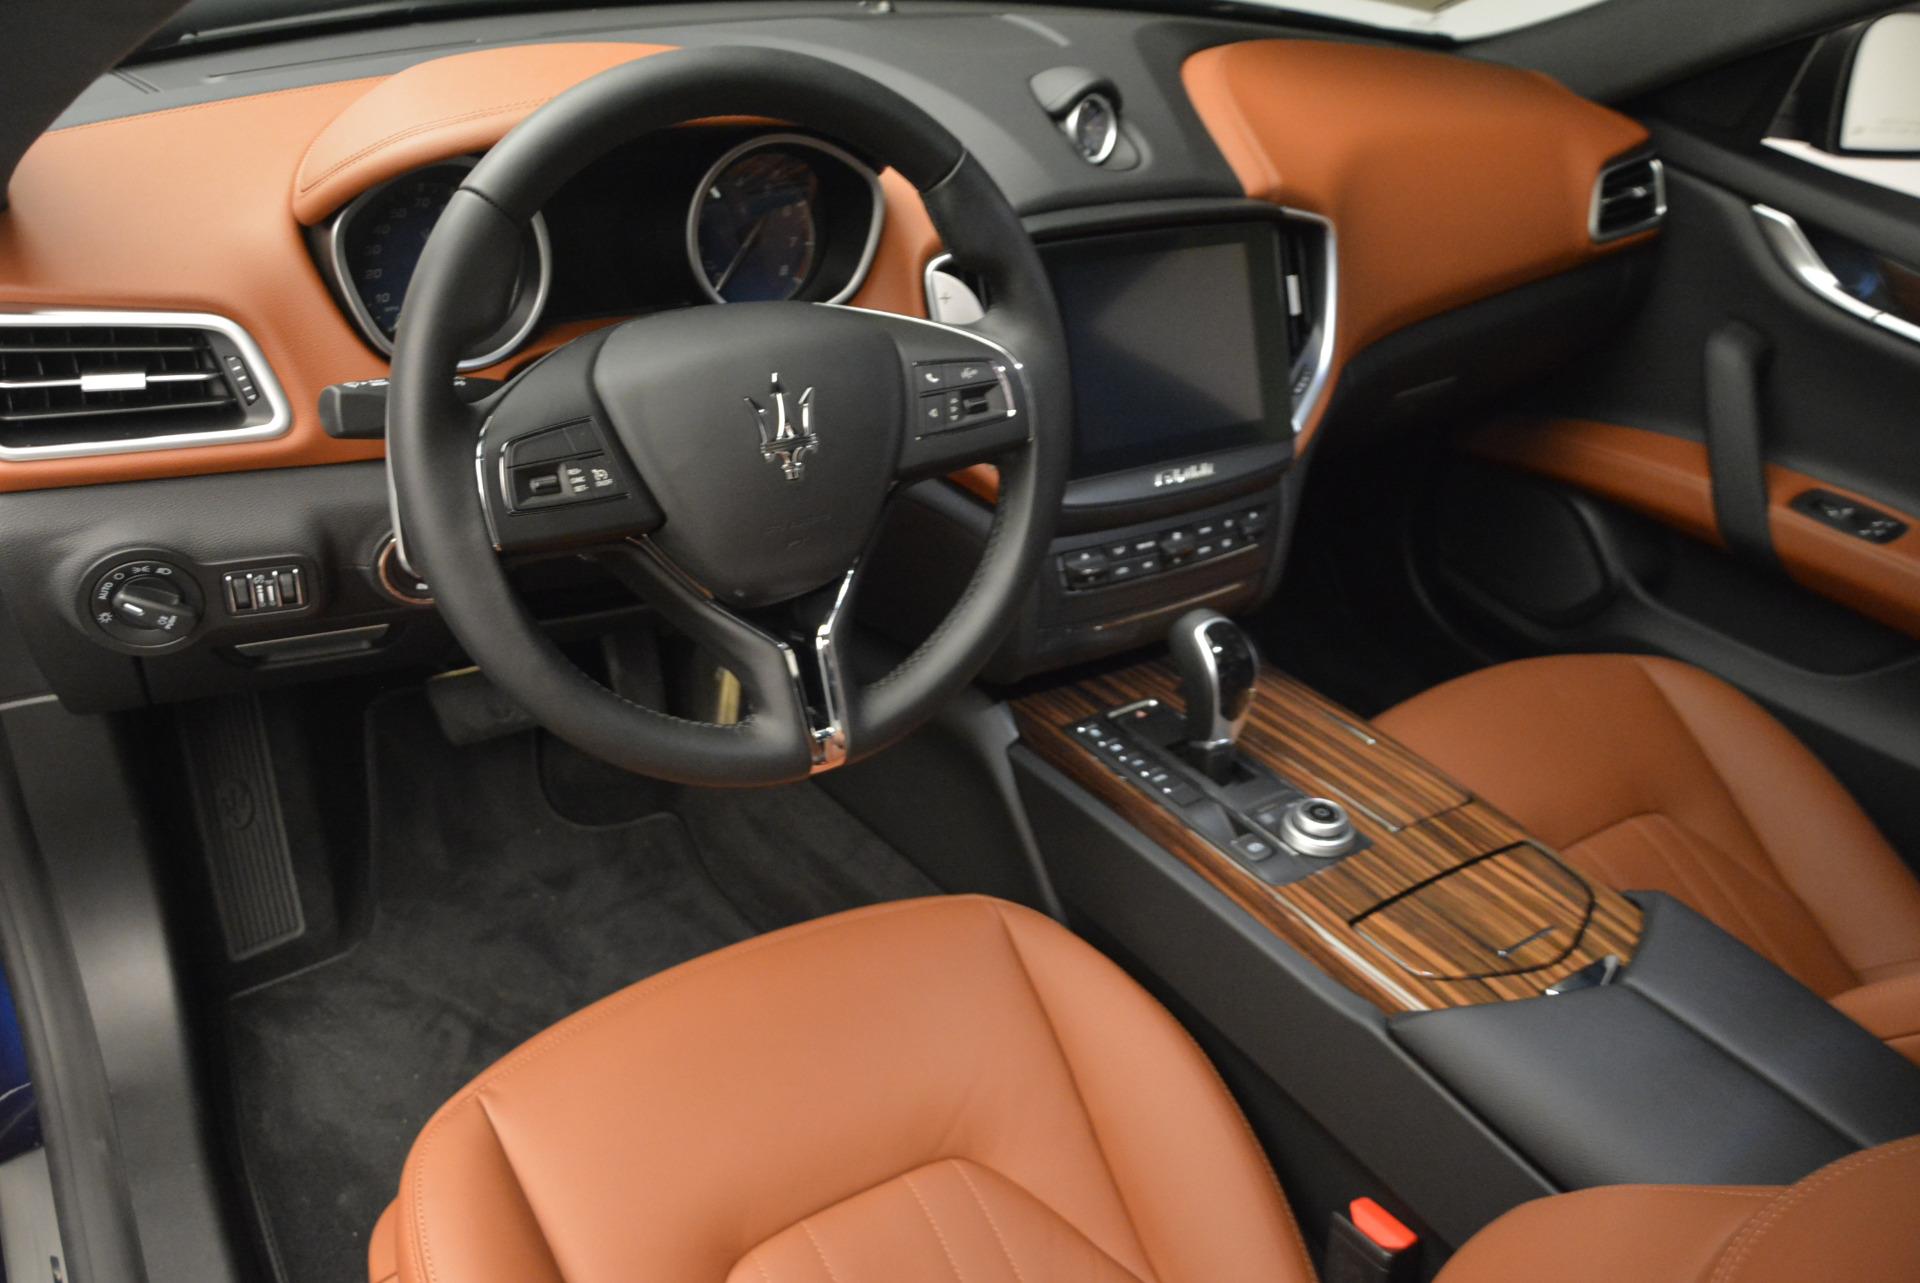 Used 2017 Maserati Ghibli S Q4 - EX Loaner For Sale In Greenwich, CT 567_p13